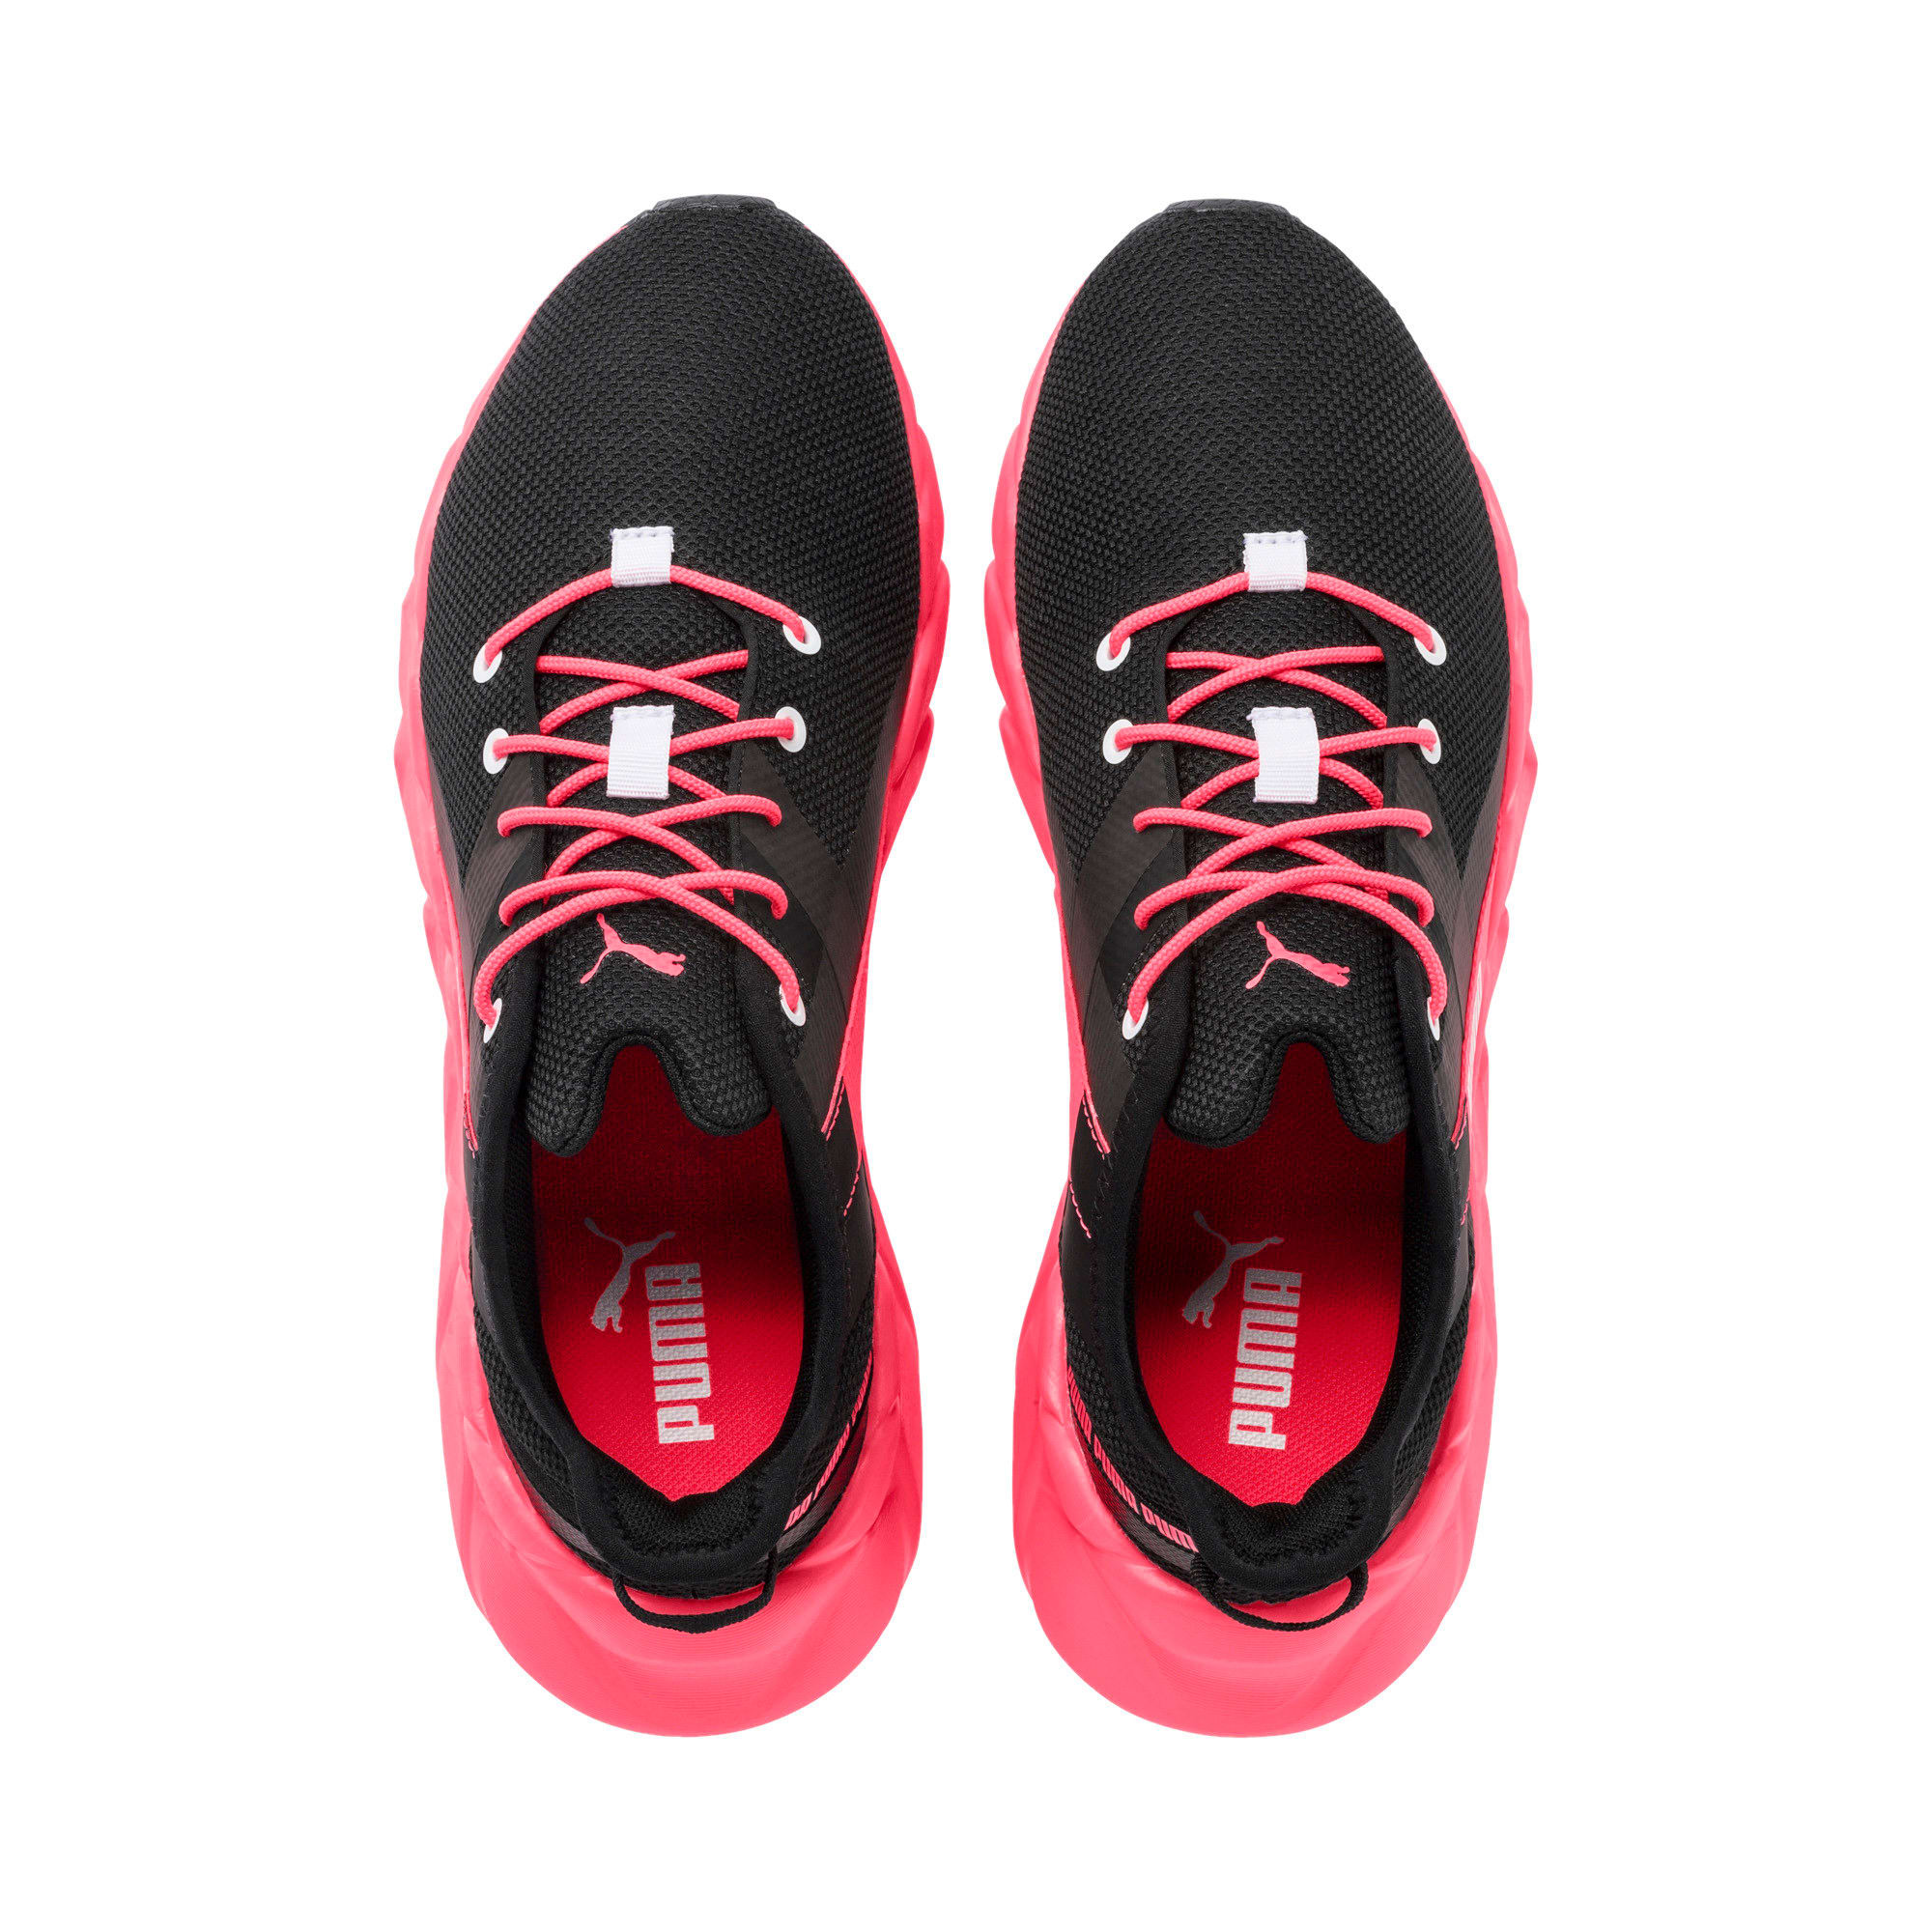 Thumbnail 7 of Weave XT Women's Training Shoes, Puma Black-Pink Alert, medium